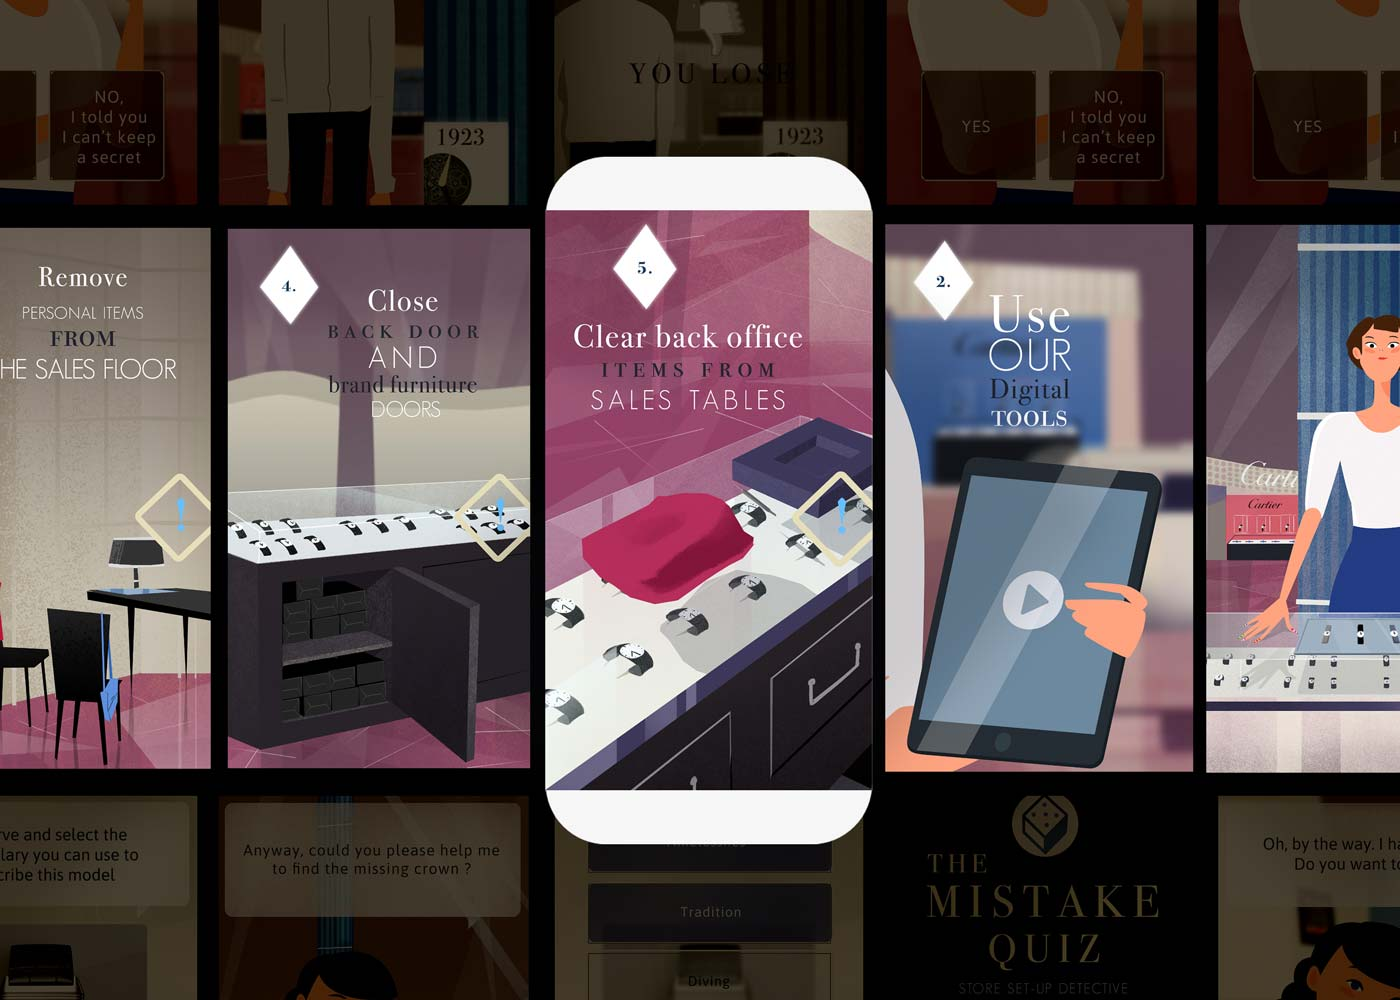 adesias-etude-de-cas-brand-richemont-mobile-learning-6